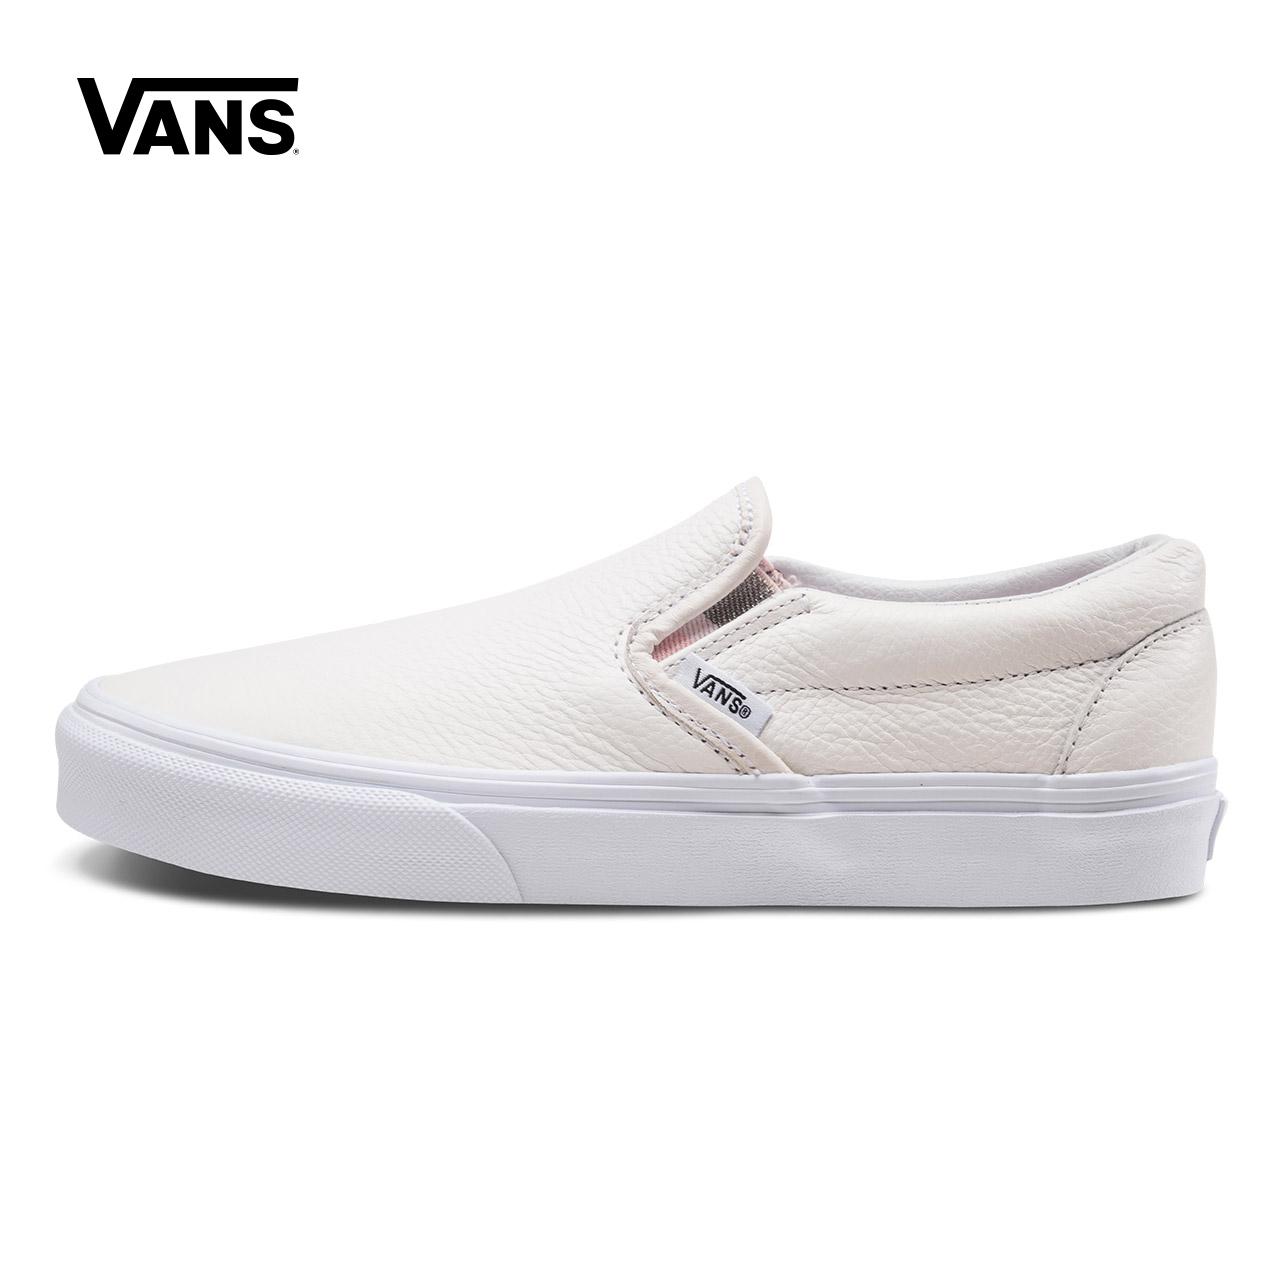 Vans 范斯官方女款SLIP-ON板鞋|VN0A38F7U7J